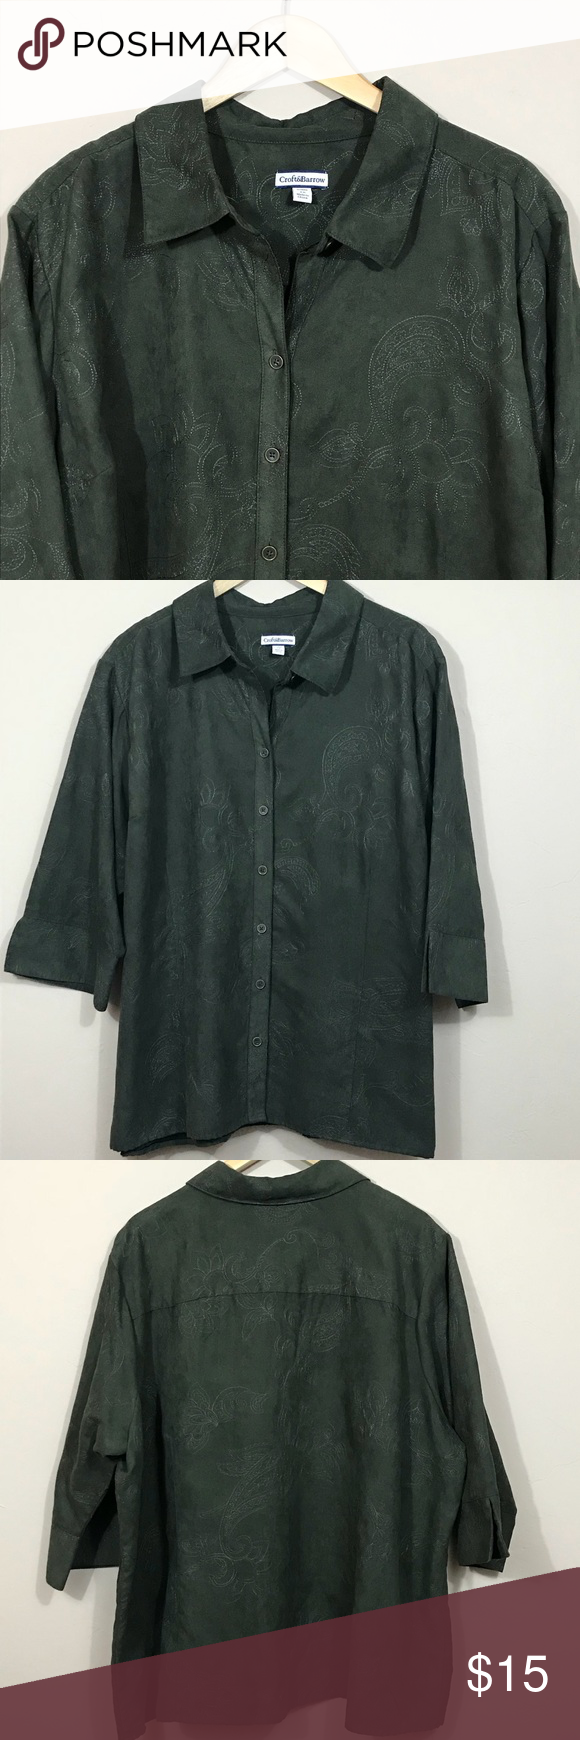 Croft u Barrow army green embossed faux suede top  My Posh Closet